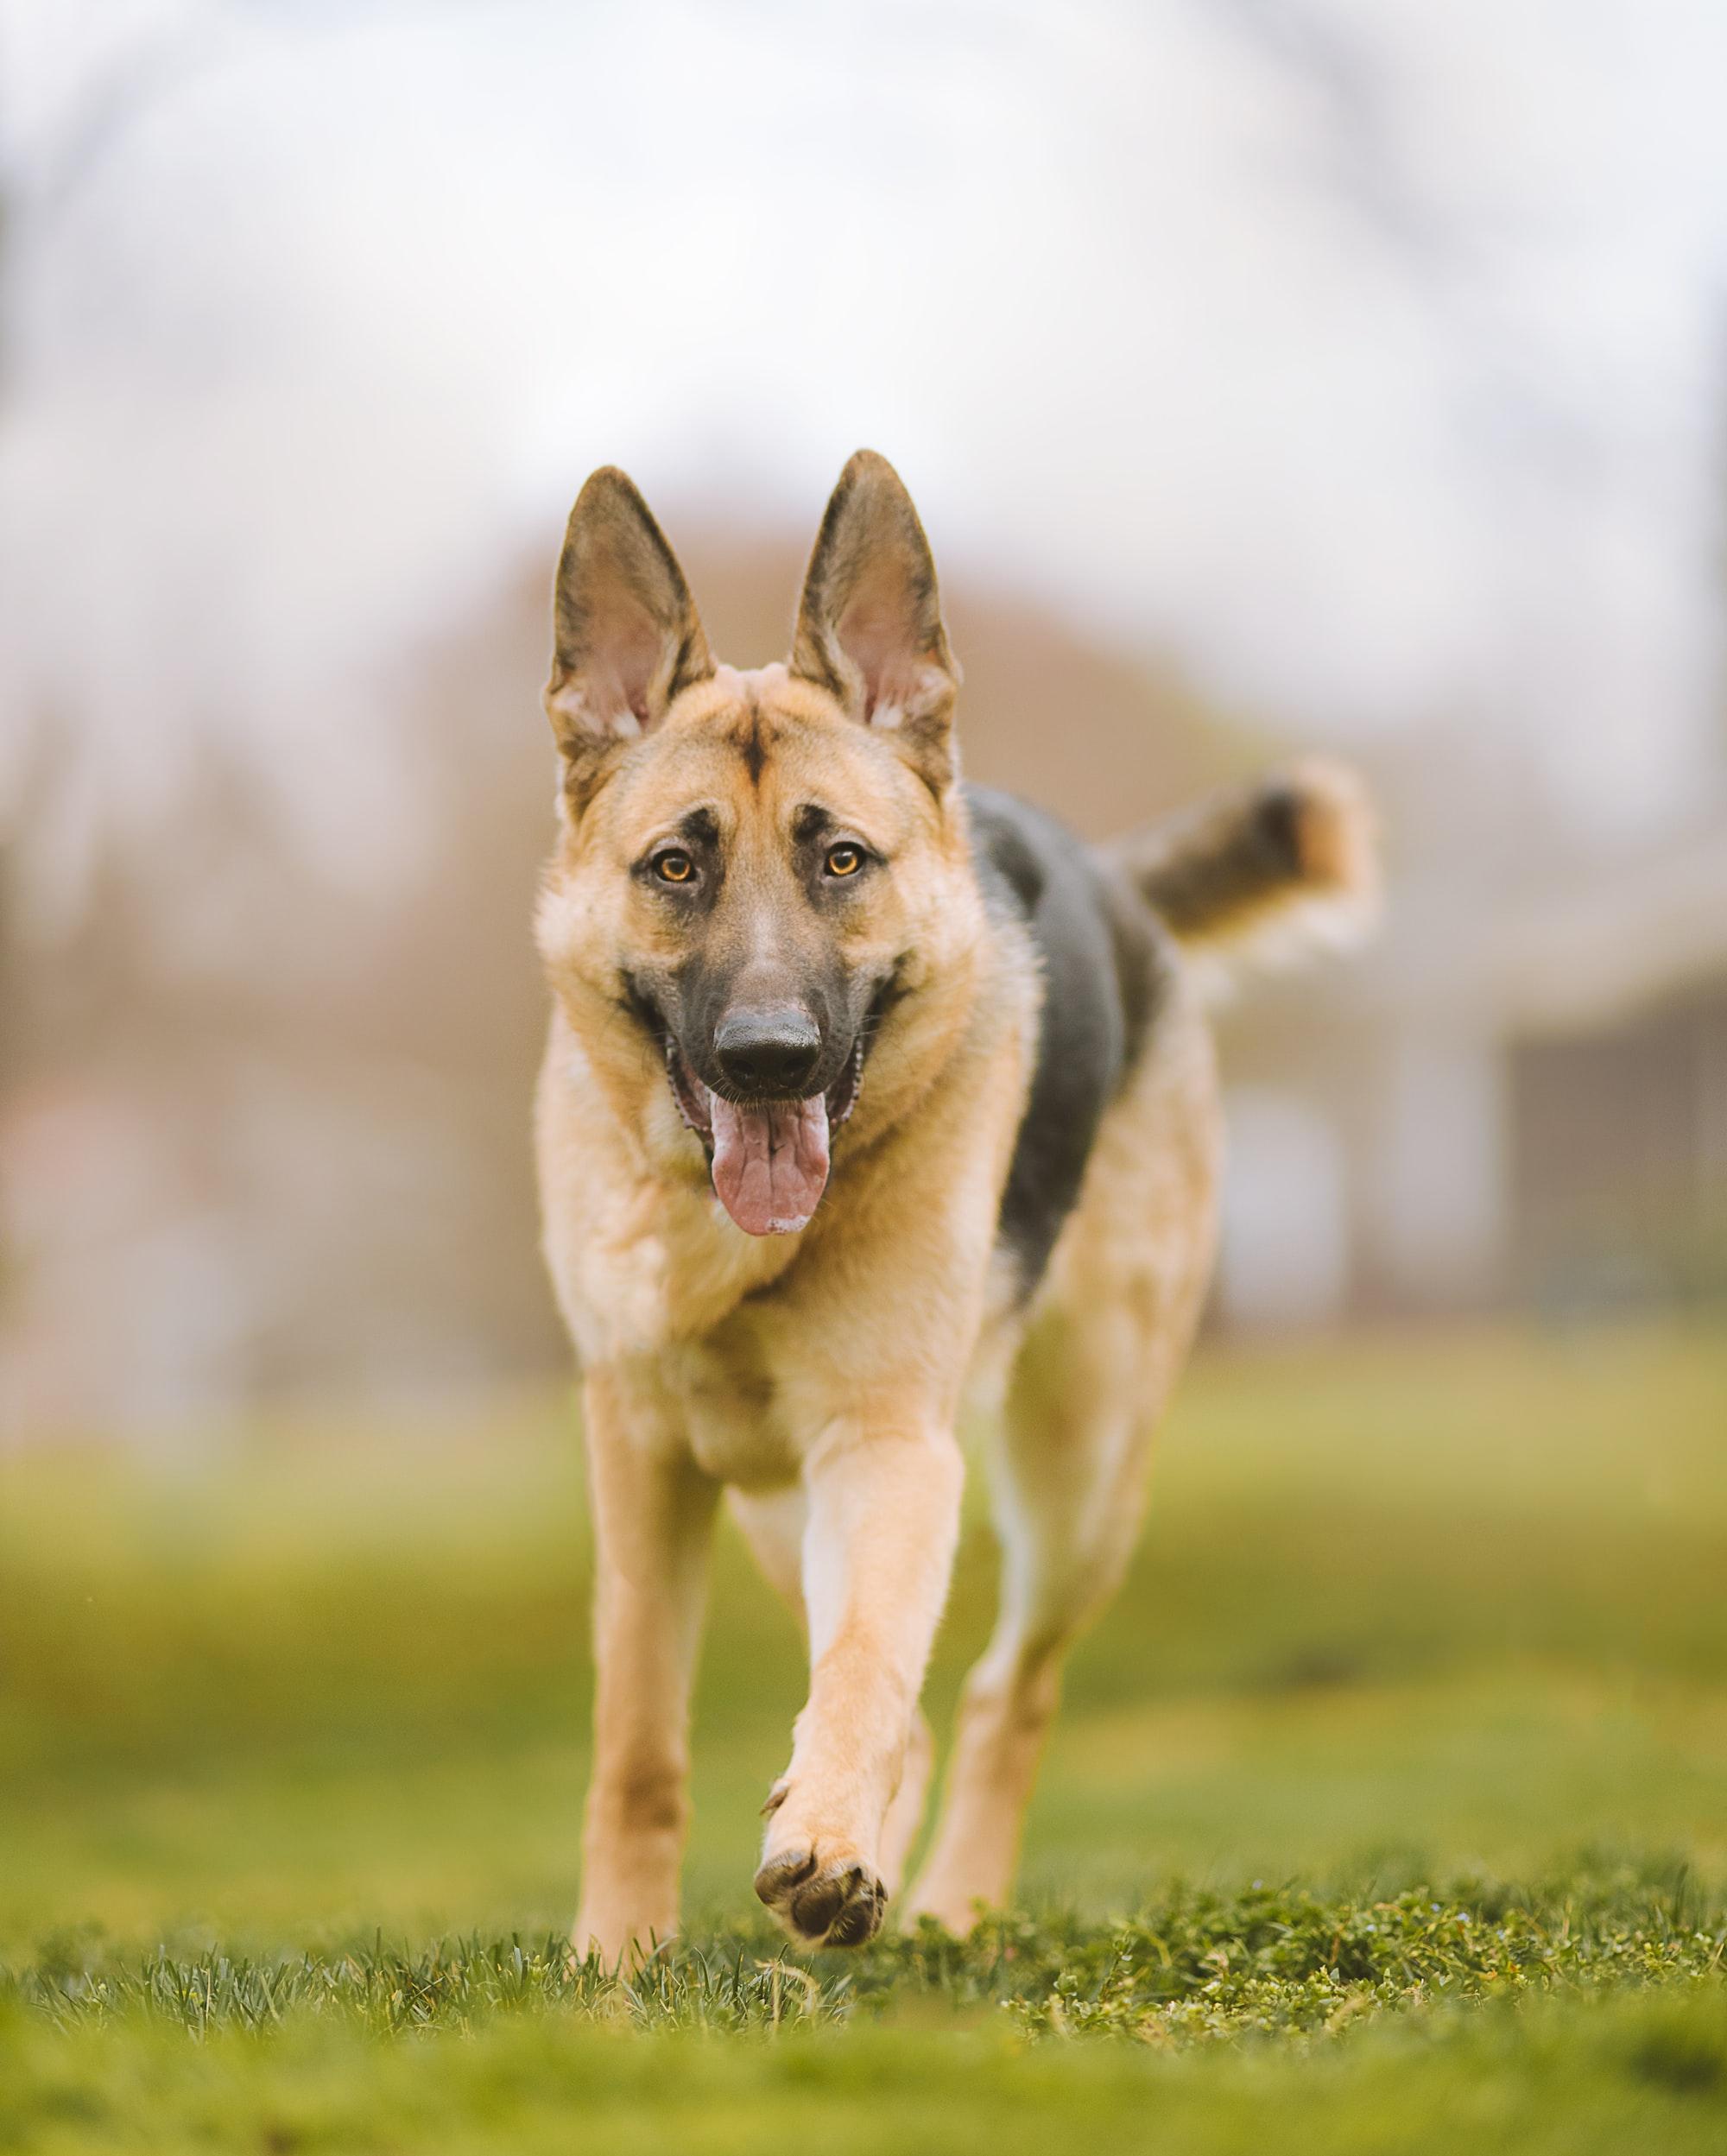 A German Shepherd runs towards the camera.